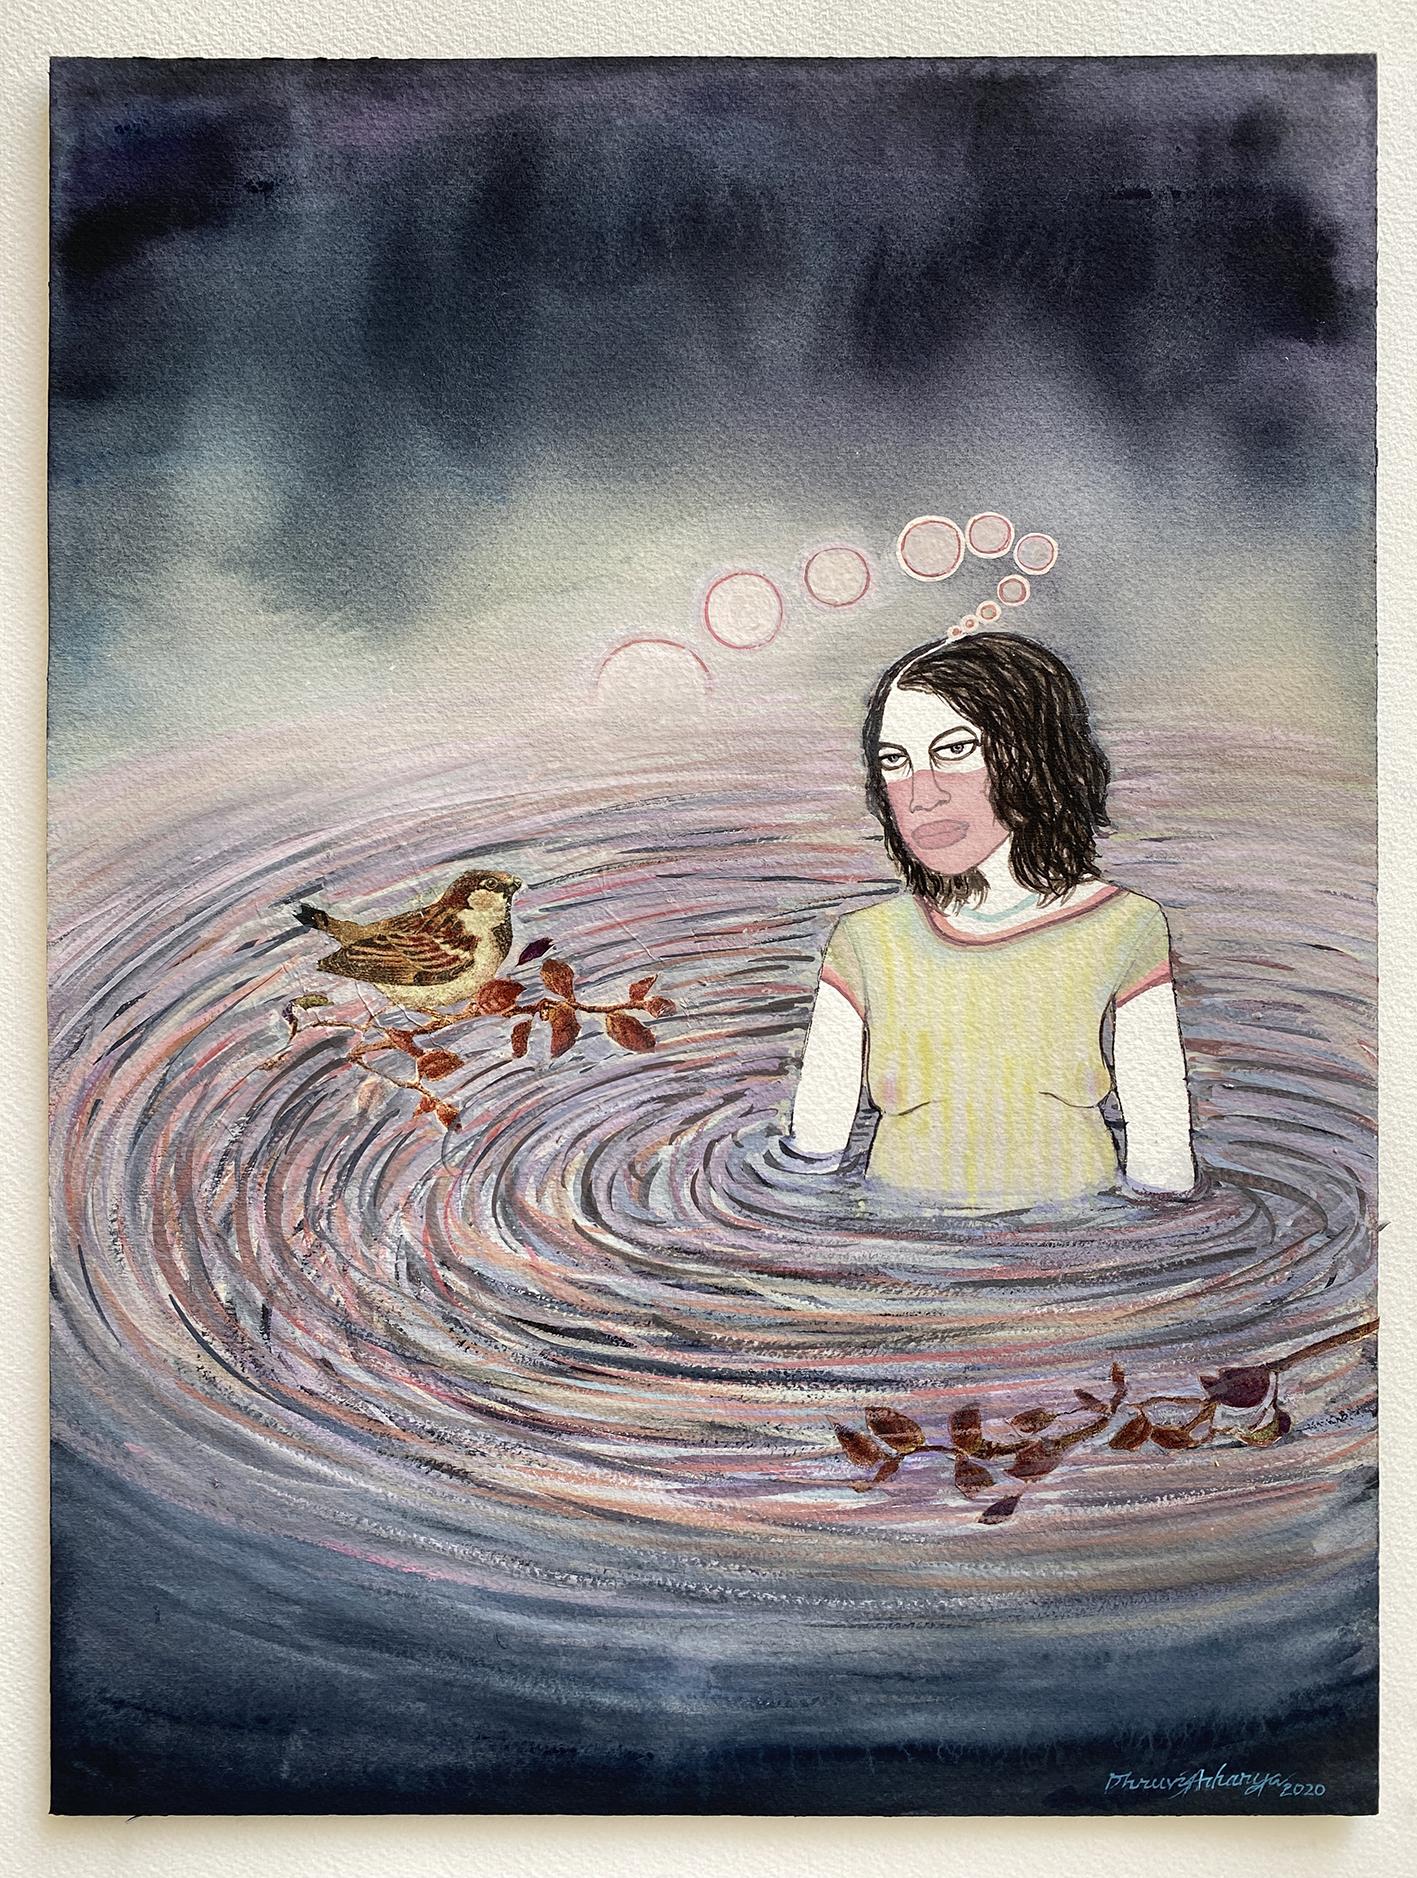 A painting by Dhruvi Acharya.